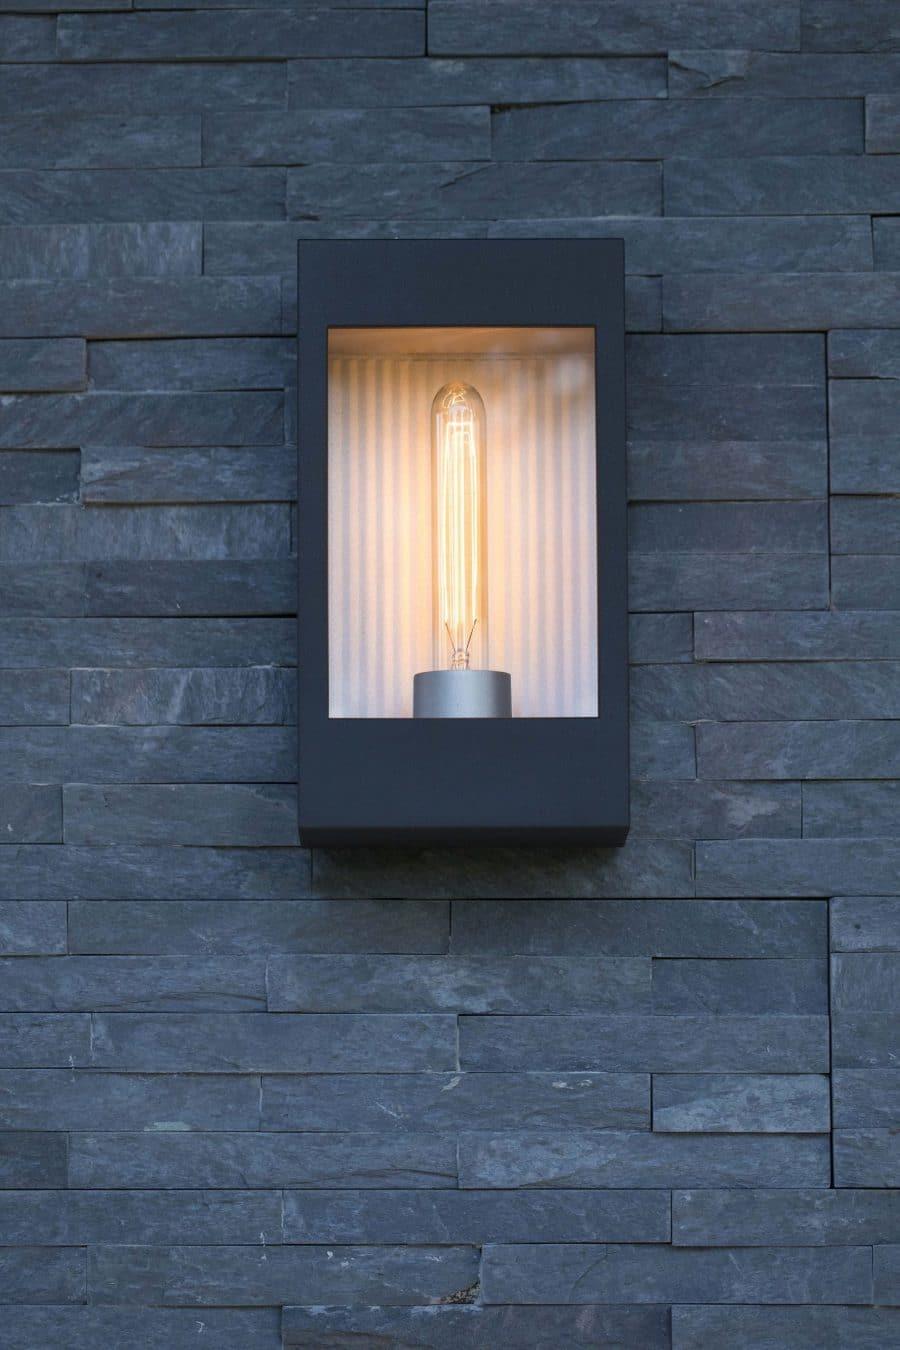 buitenverlichting Brick wandlamp roger pradier buitenlamp tuinextra kaatsheuvel